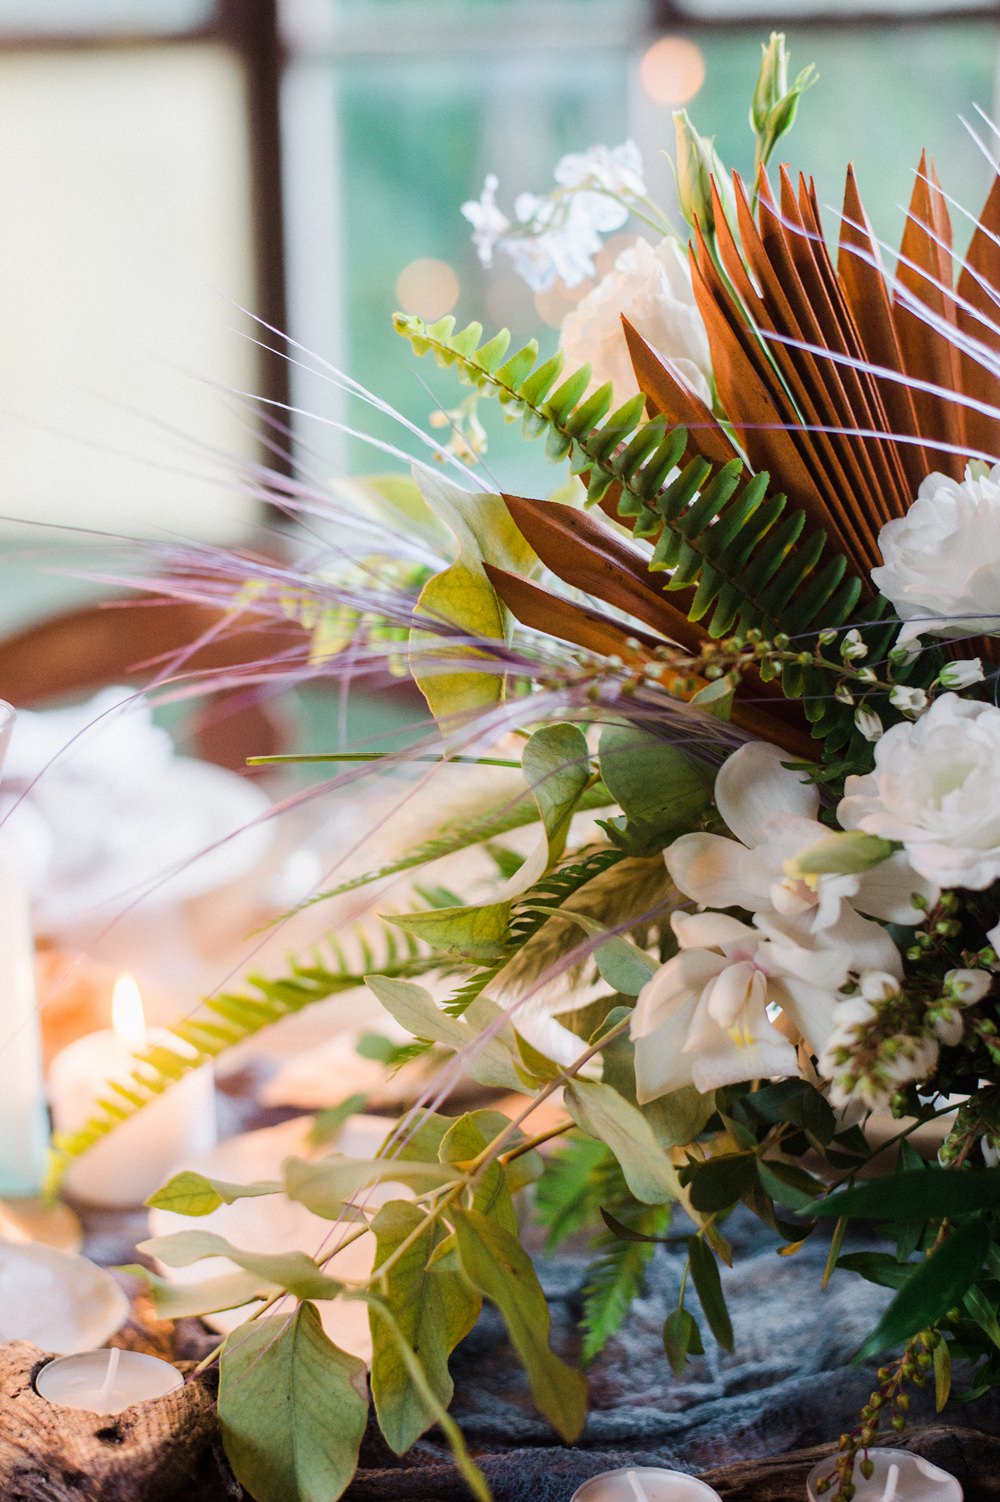 Nature Inspired Styled Shoot Seashell Tablescape Candles Grey Blue Dahlia Fern Floral Centrepiece   Ocean Wedding Ideas Industrial Rachel Watkinson Photography